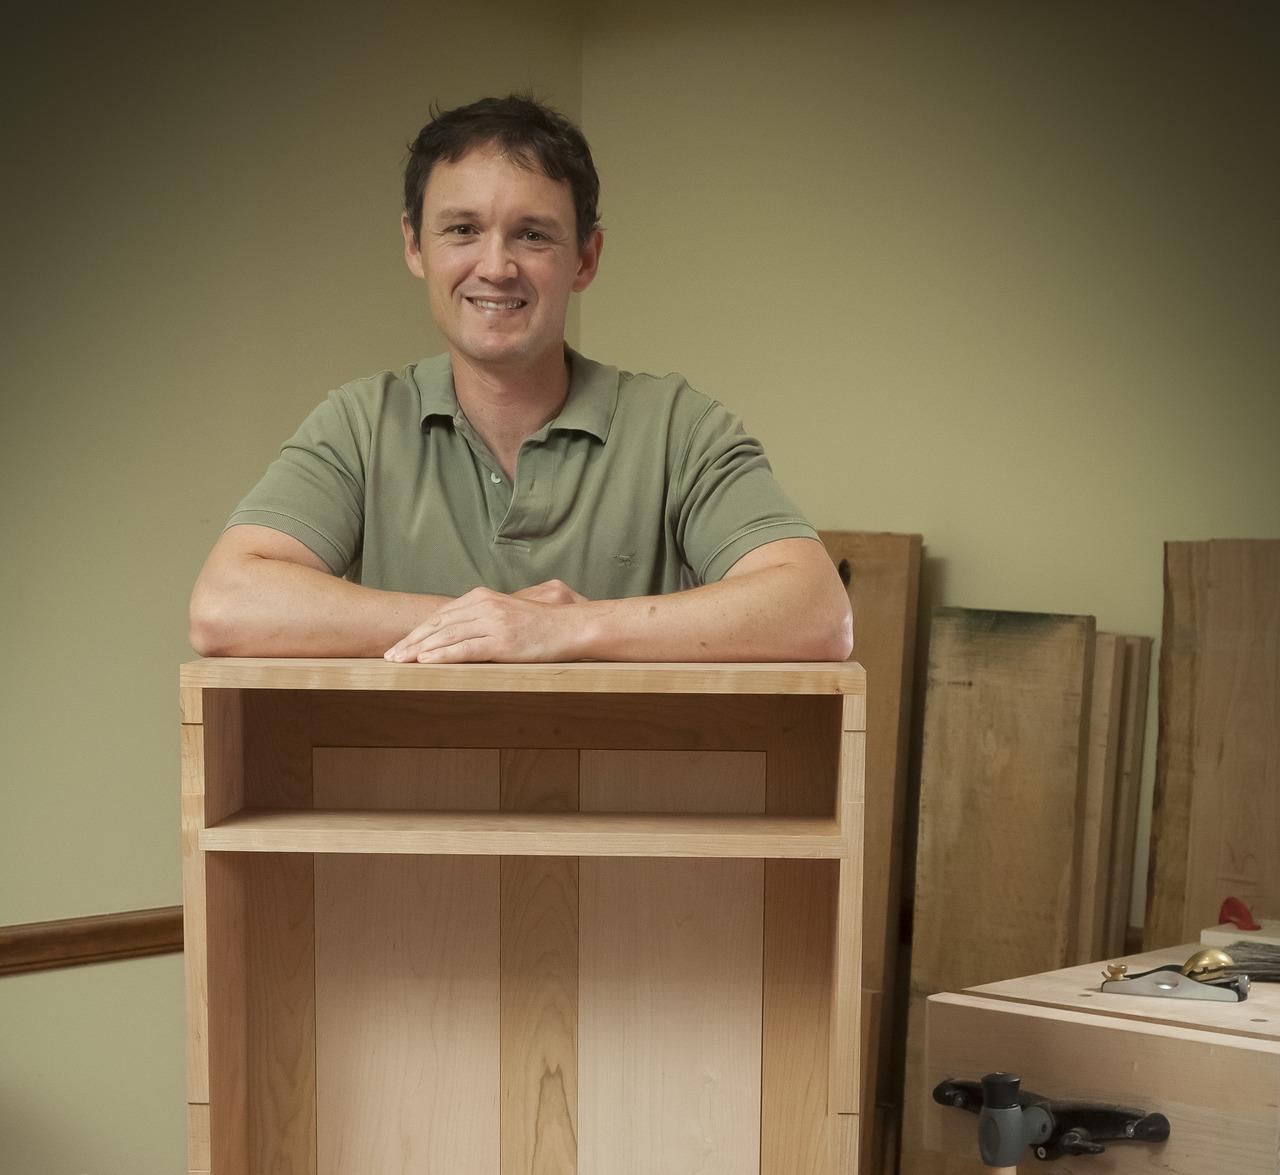 Damion Fauser Bespoke Woodworker Amp Furniture Maker